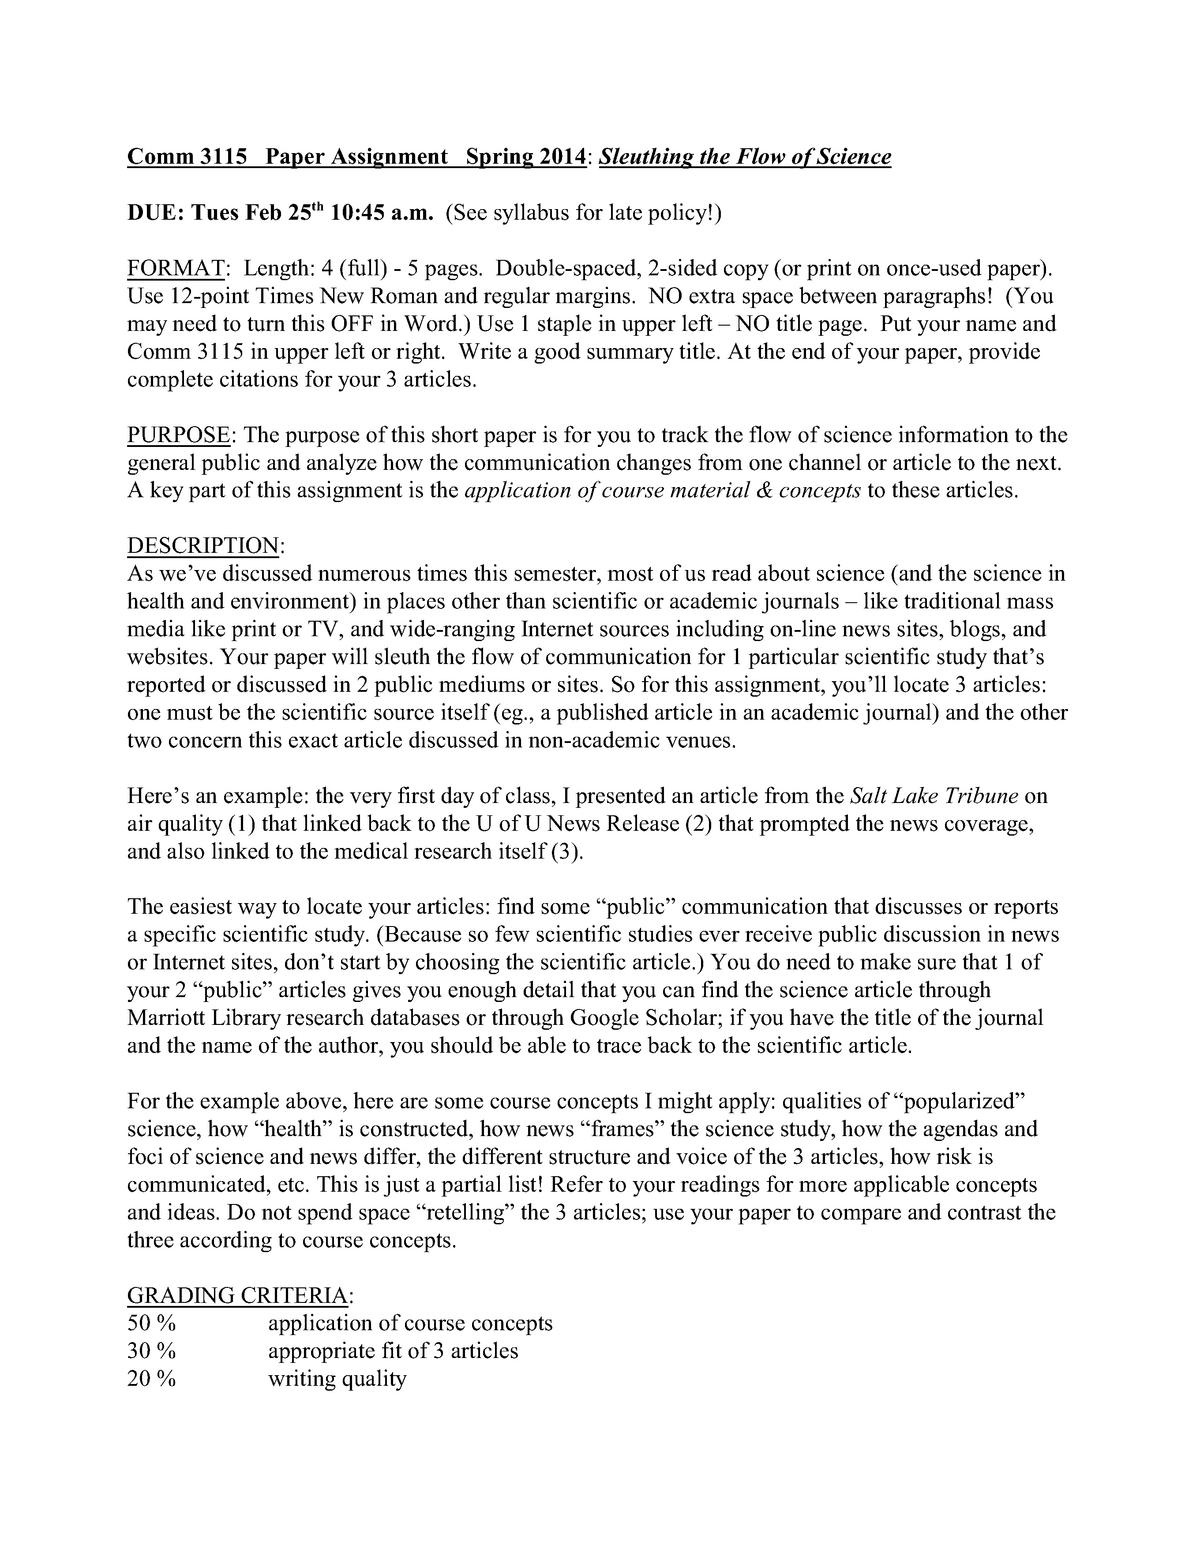 Asignment 1 paper sci flow - COMM 3115: Comm Sci, Health